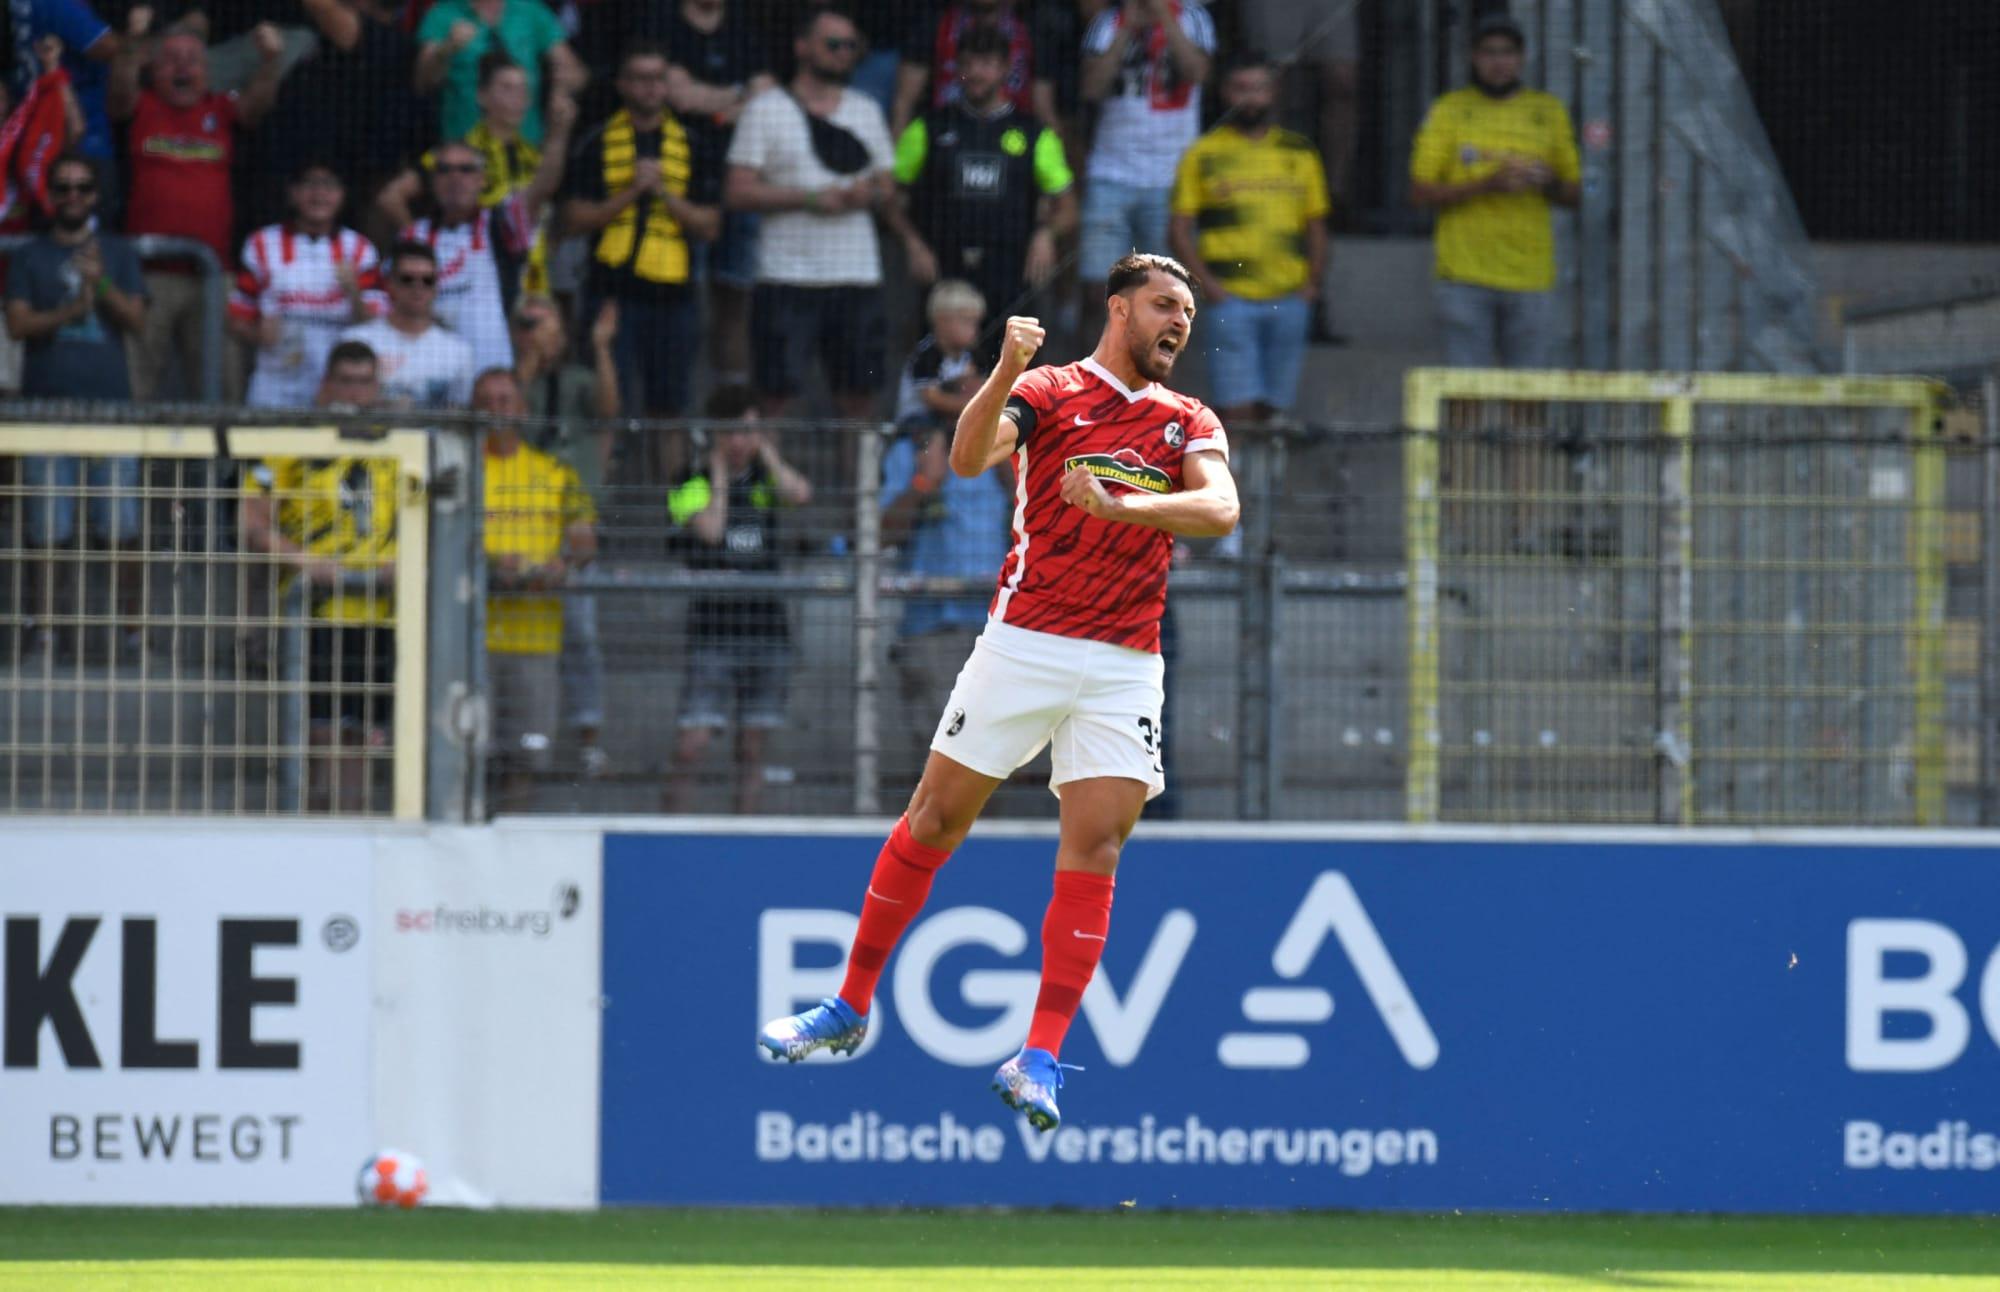 Bundesliga Roundup: Bayern survive Köln scare, Borussia Dortmund stunned by Freiburg - BVB Buzz